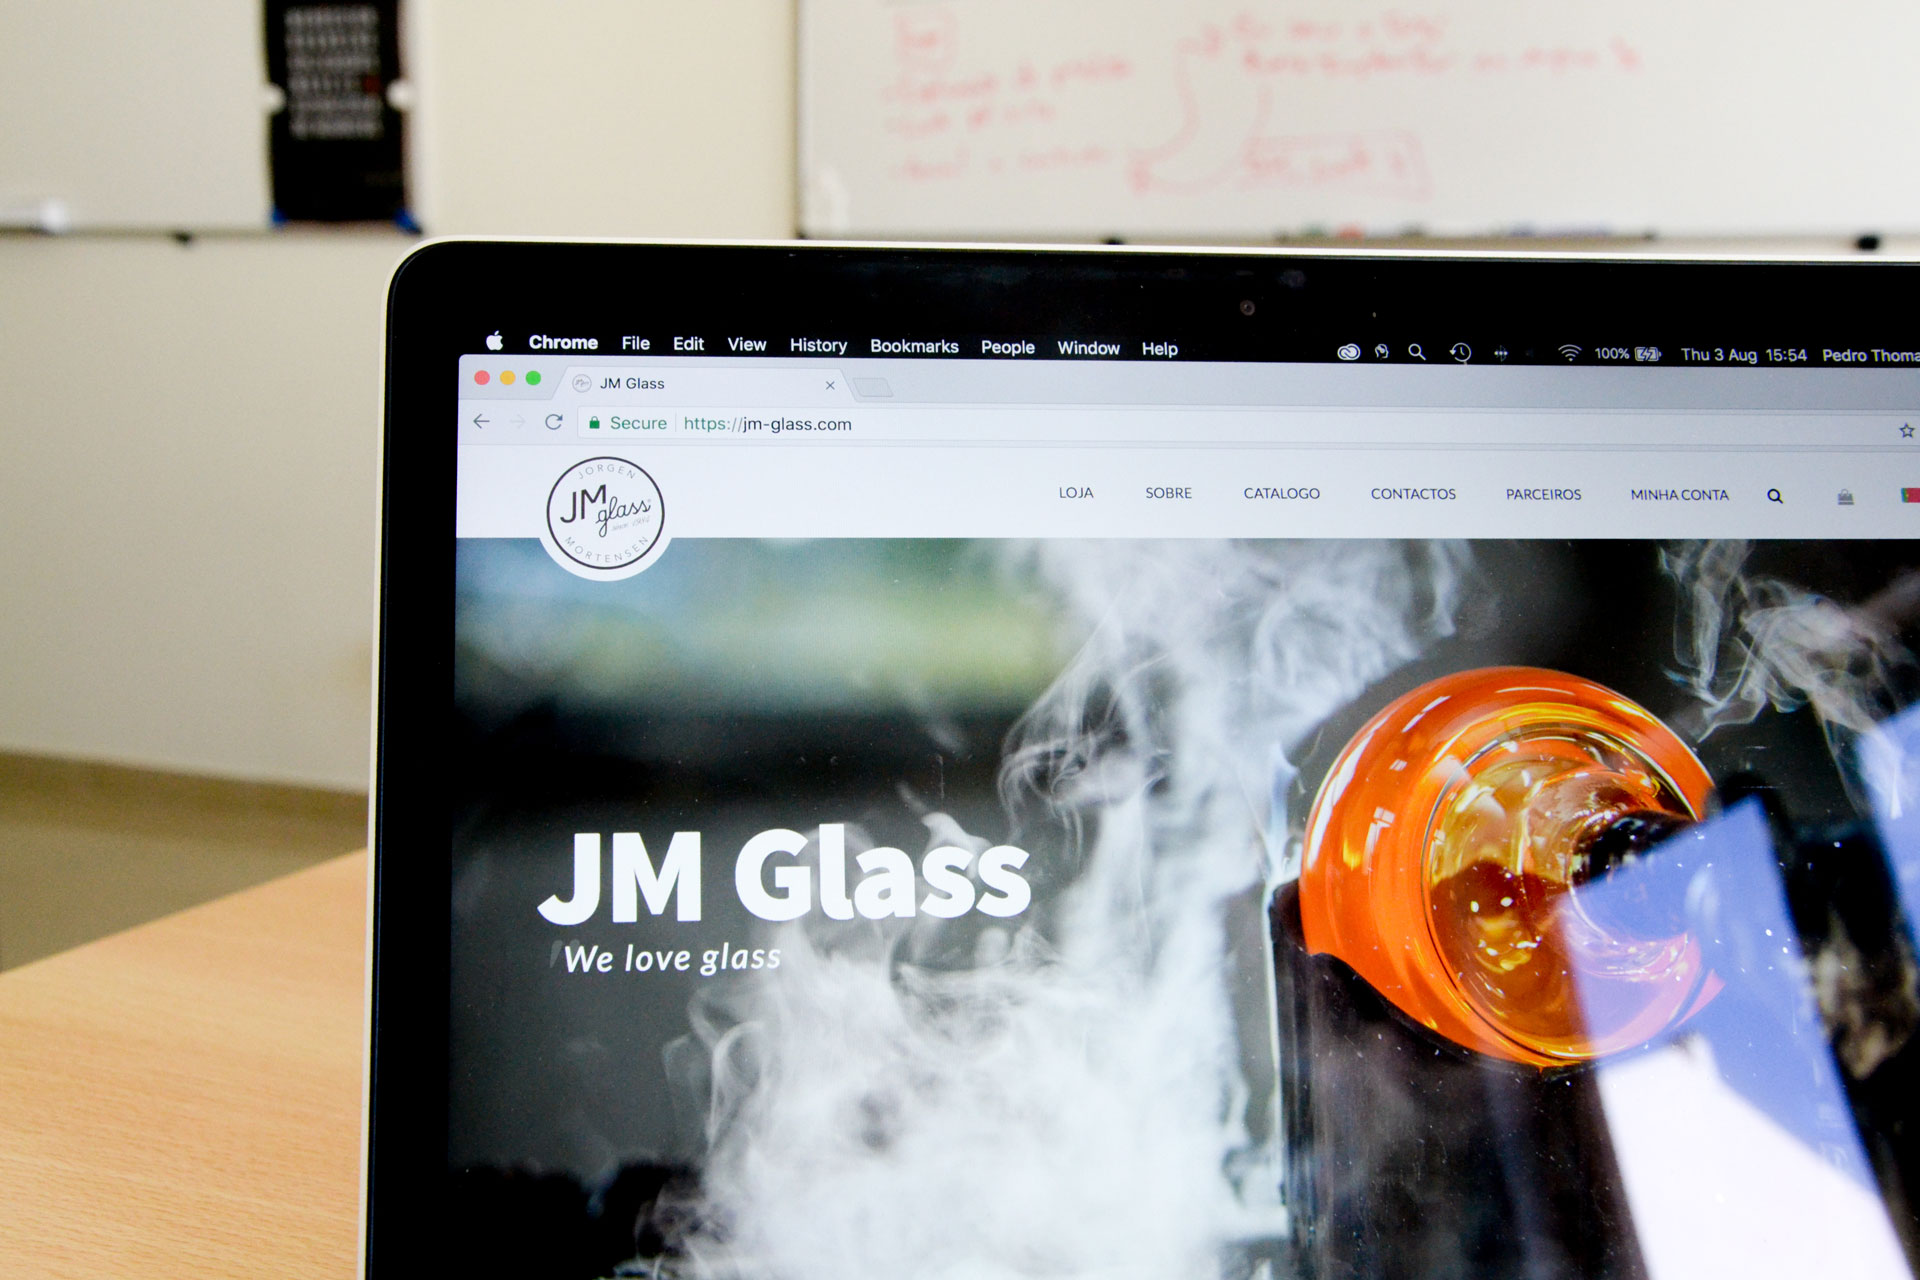 JM Glass